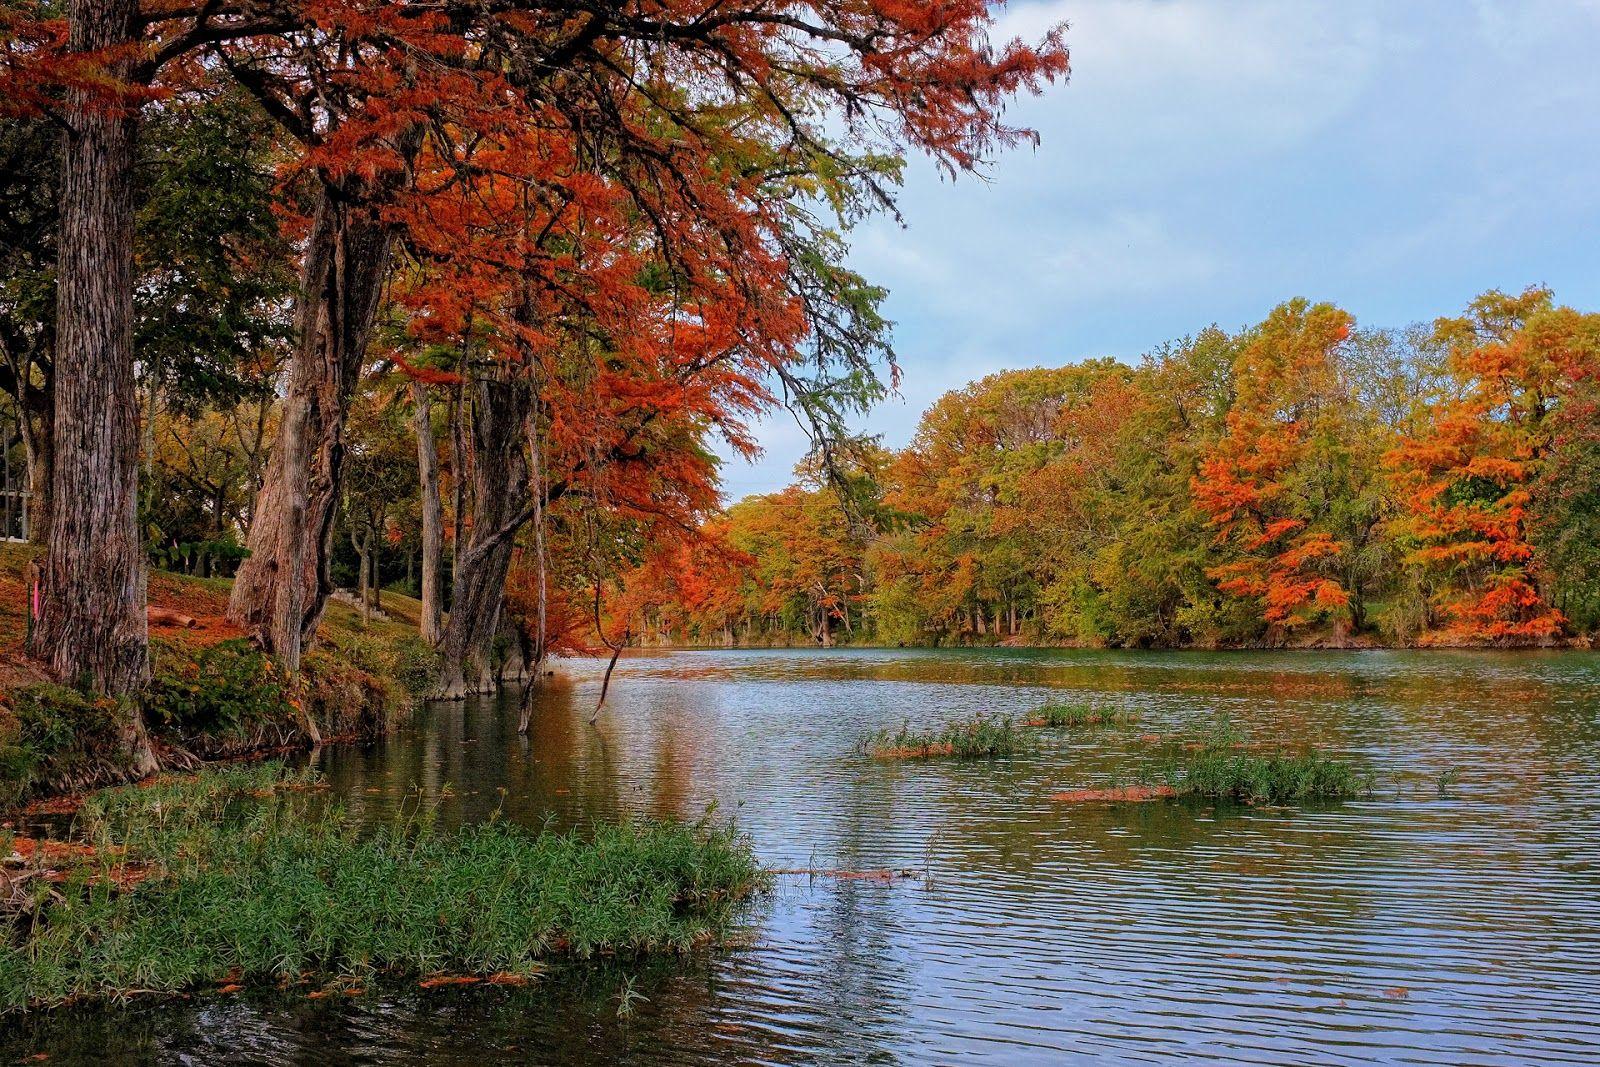 fotografias+de+paisajes,+naturaleza,+animales,+rios,+lagos,+bosques+y+montañas+(12).jpg (1600×1067)